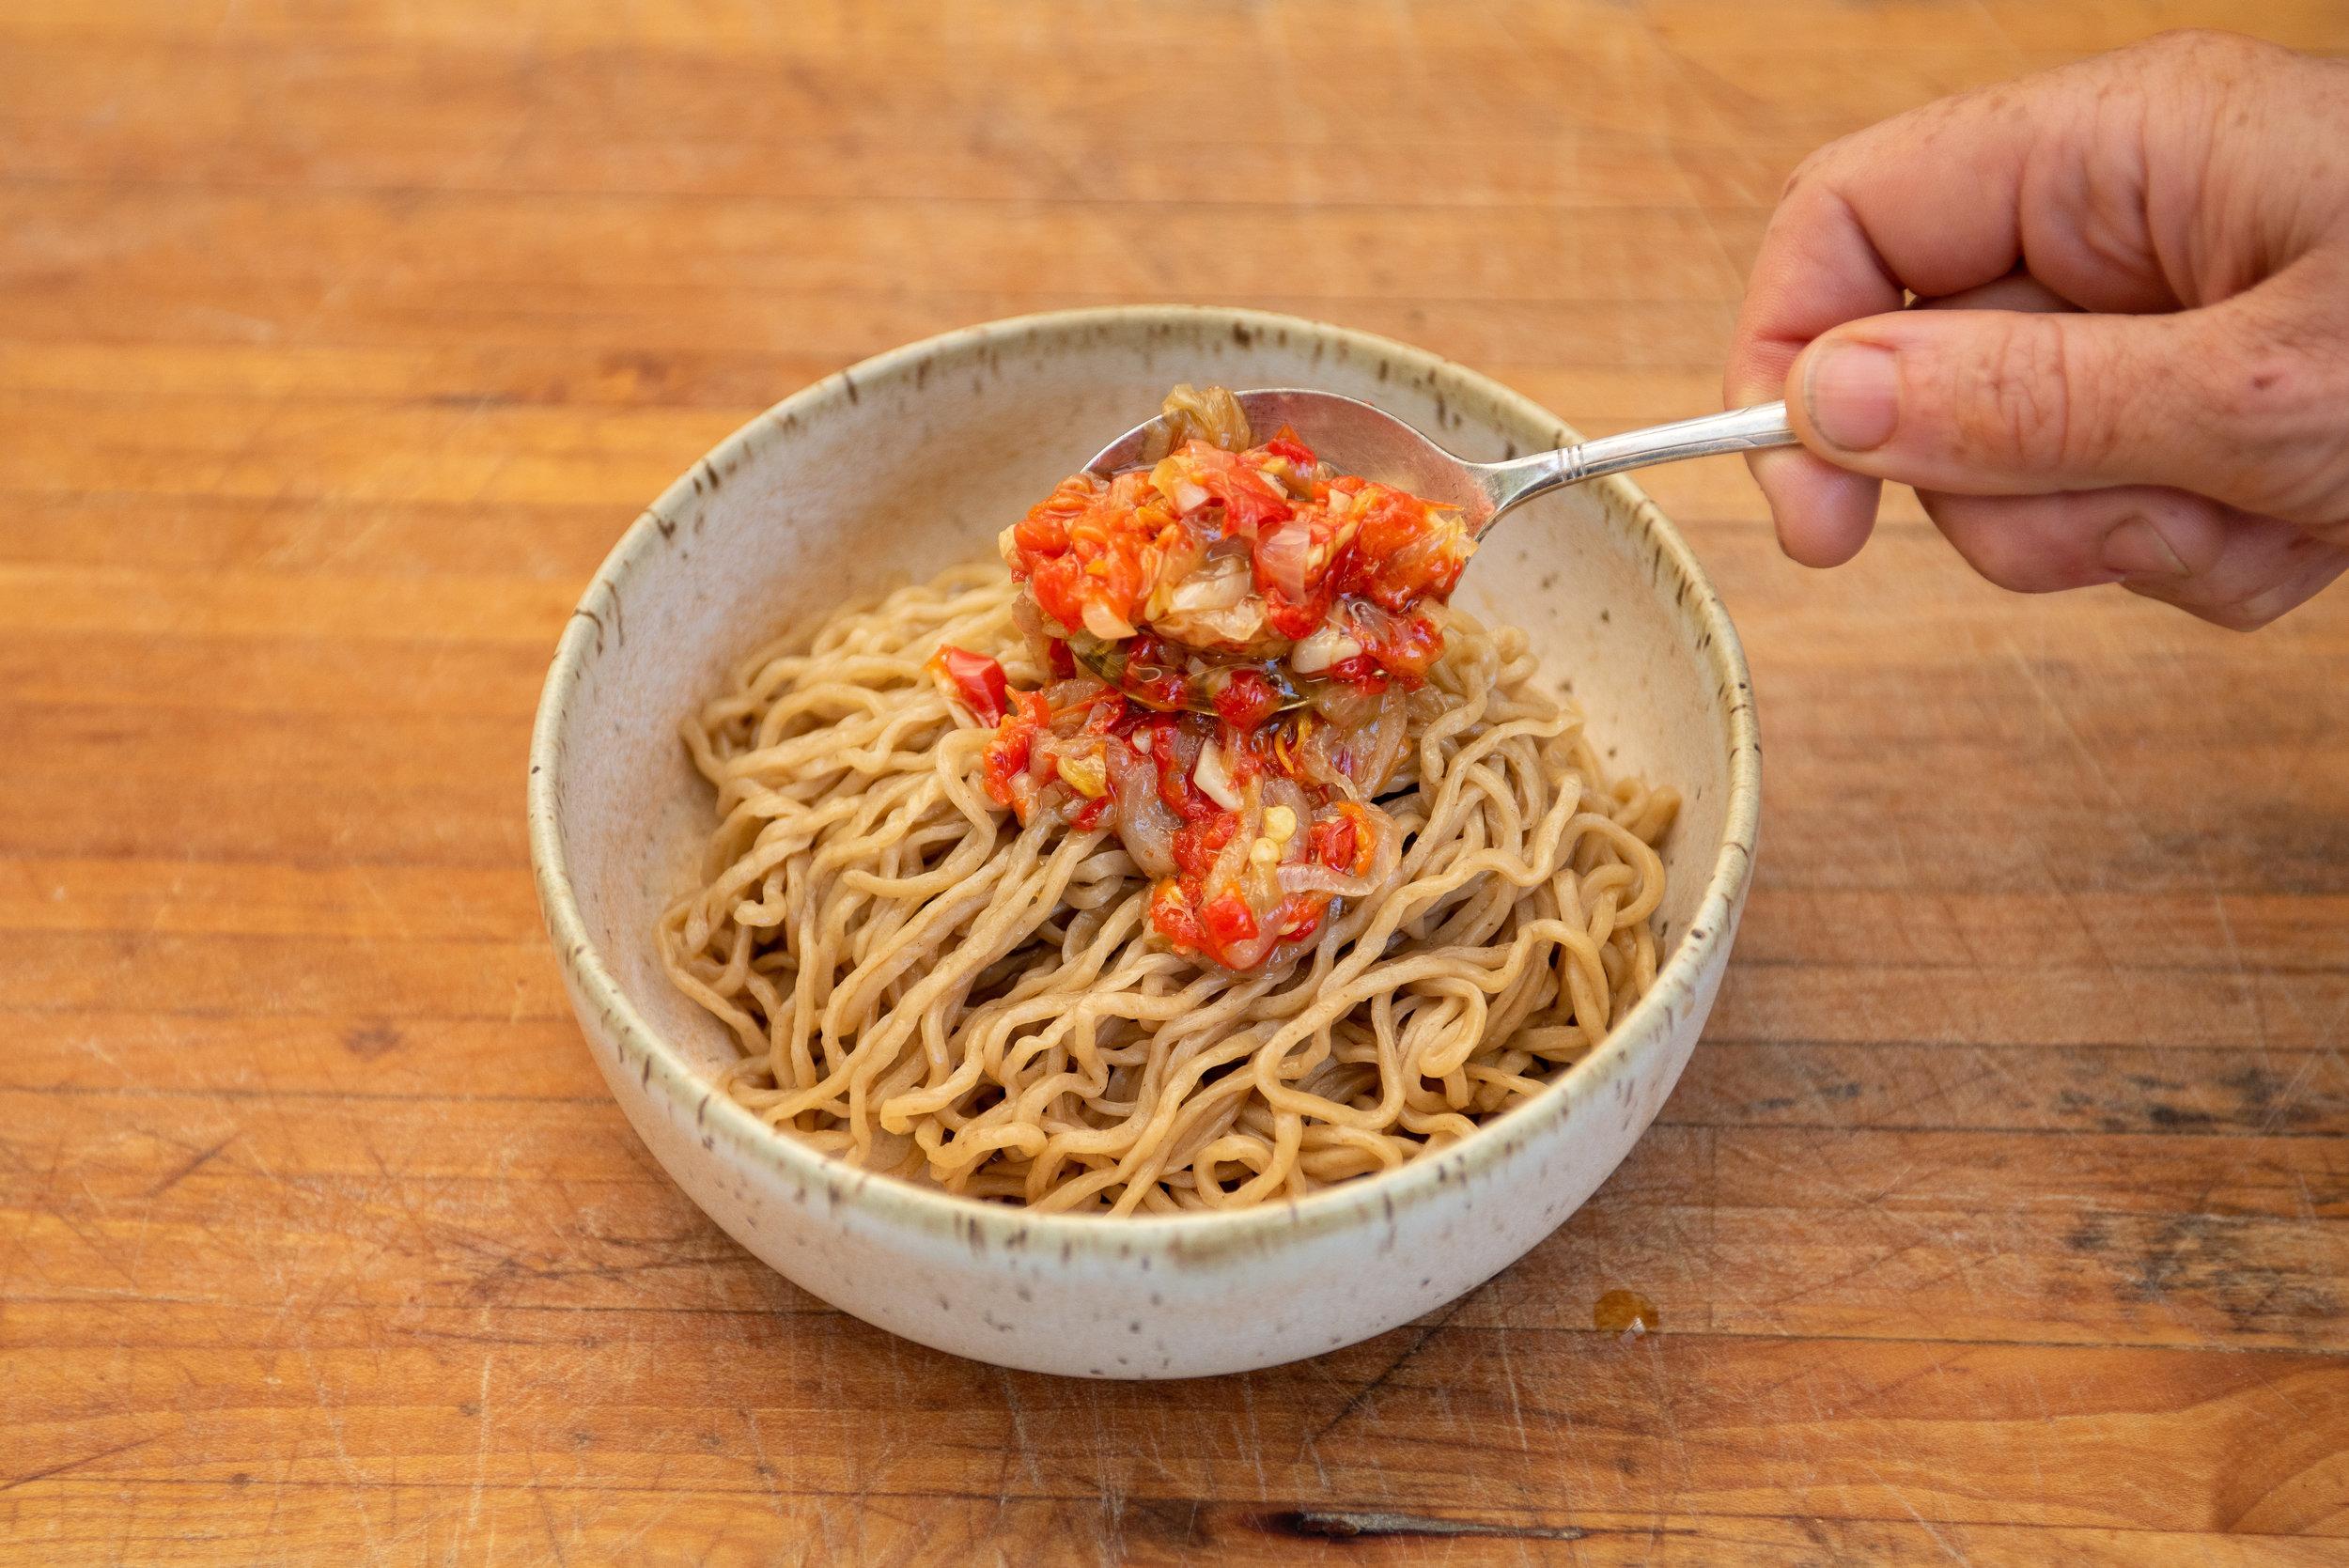 chili garlic noodles-048.jpg